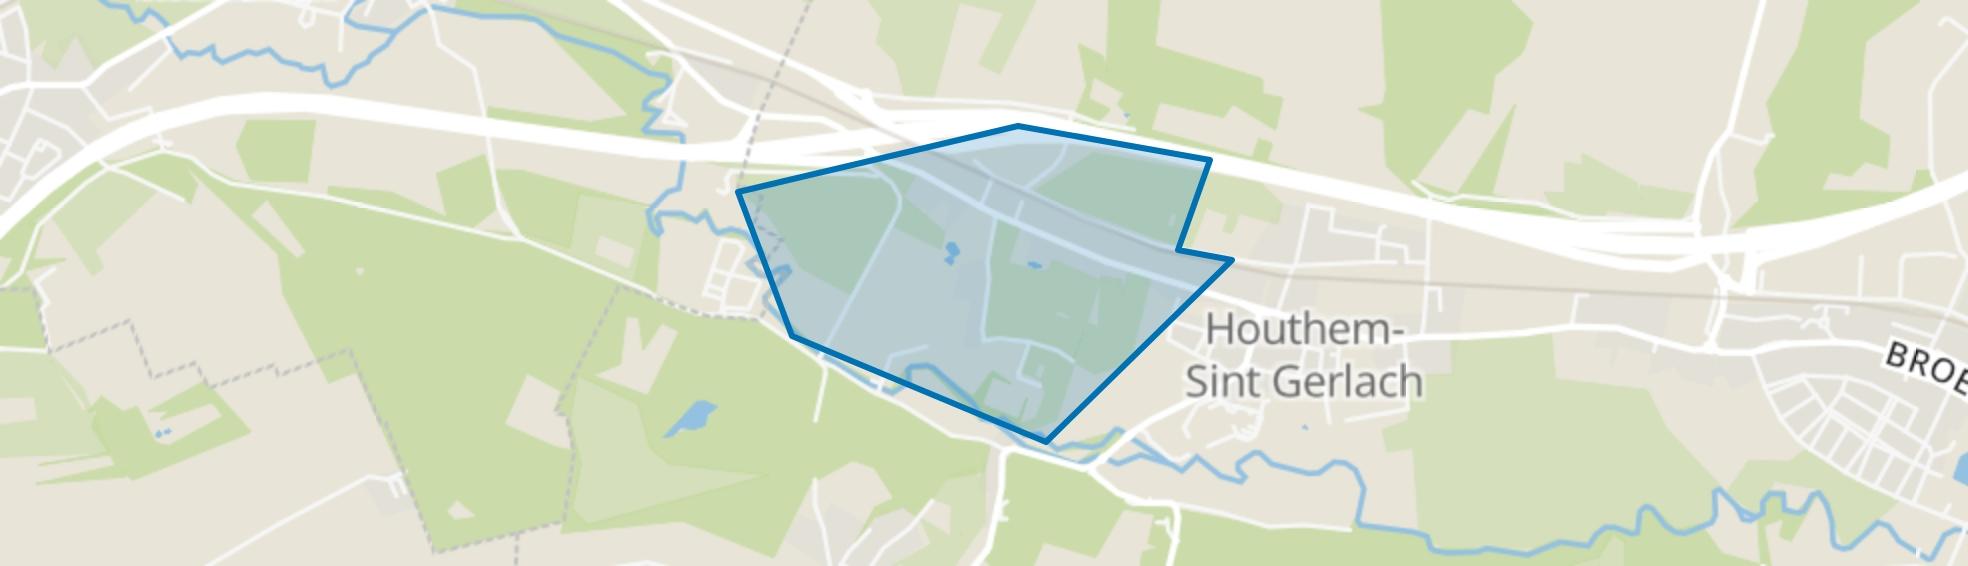 Vroenhof, Valkenburg (LI) map